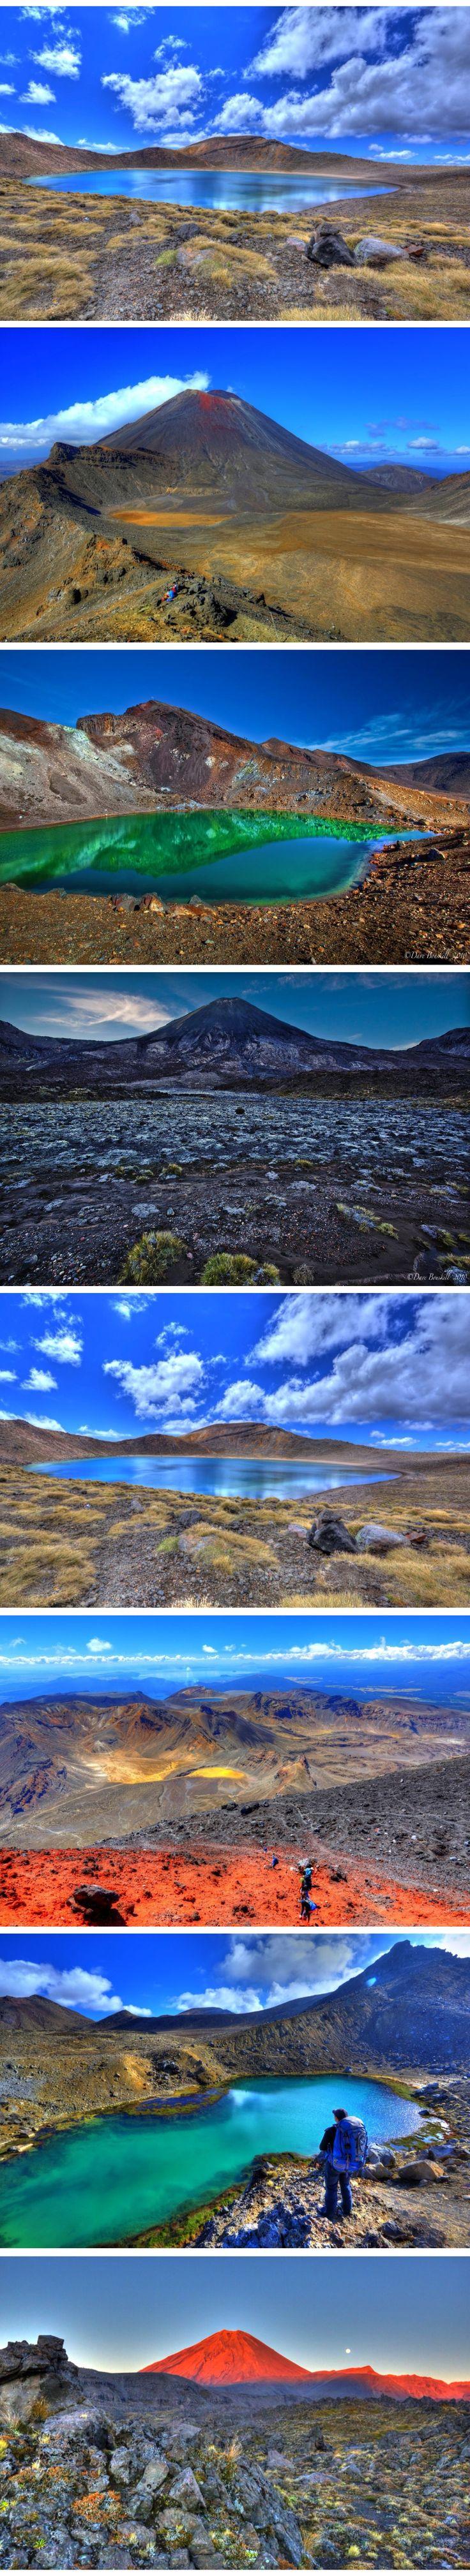 Beautiful Blue Lake along the Tongariro Alpine Crossing, Central Plateau, North Island, New Zealand